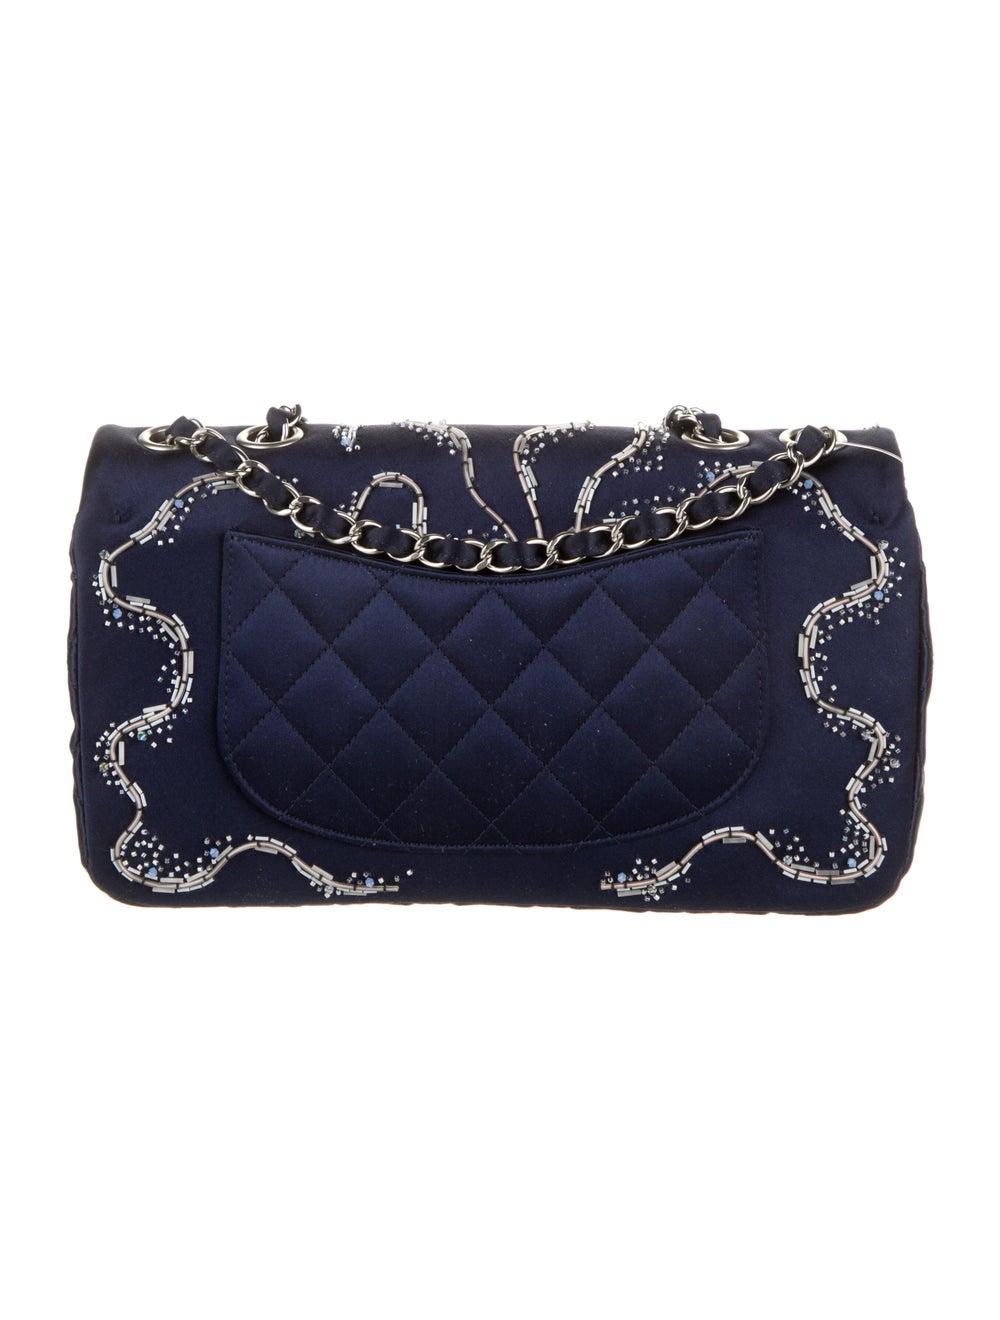 Chanel Satin LED Flap Bag Blue - image 4